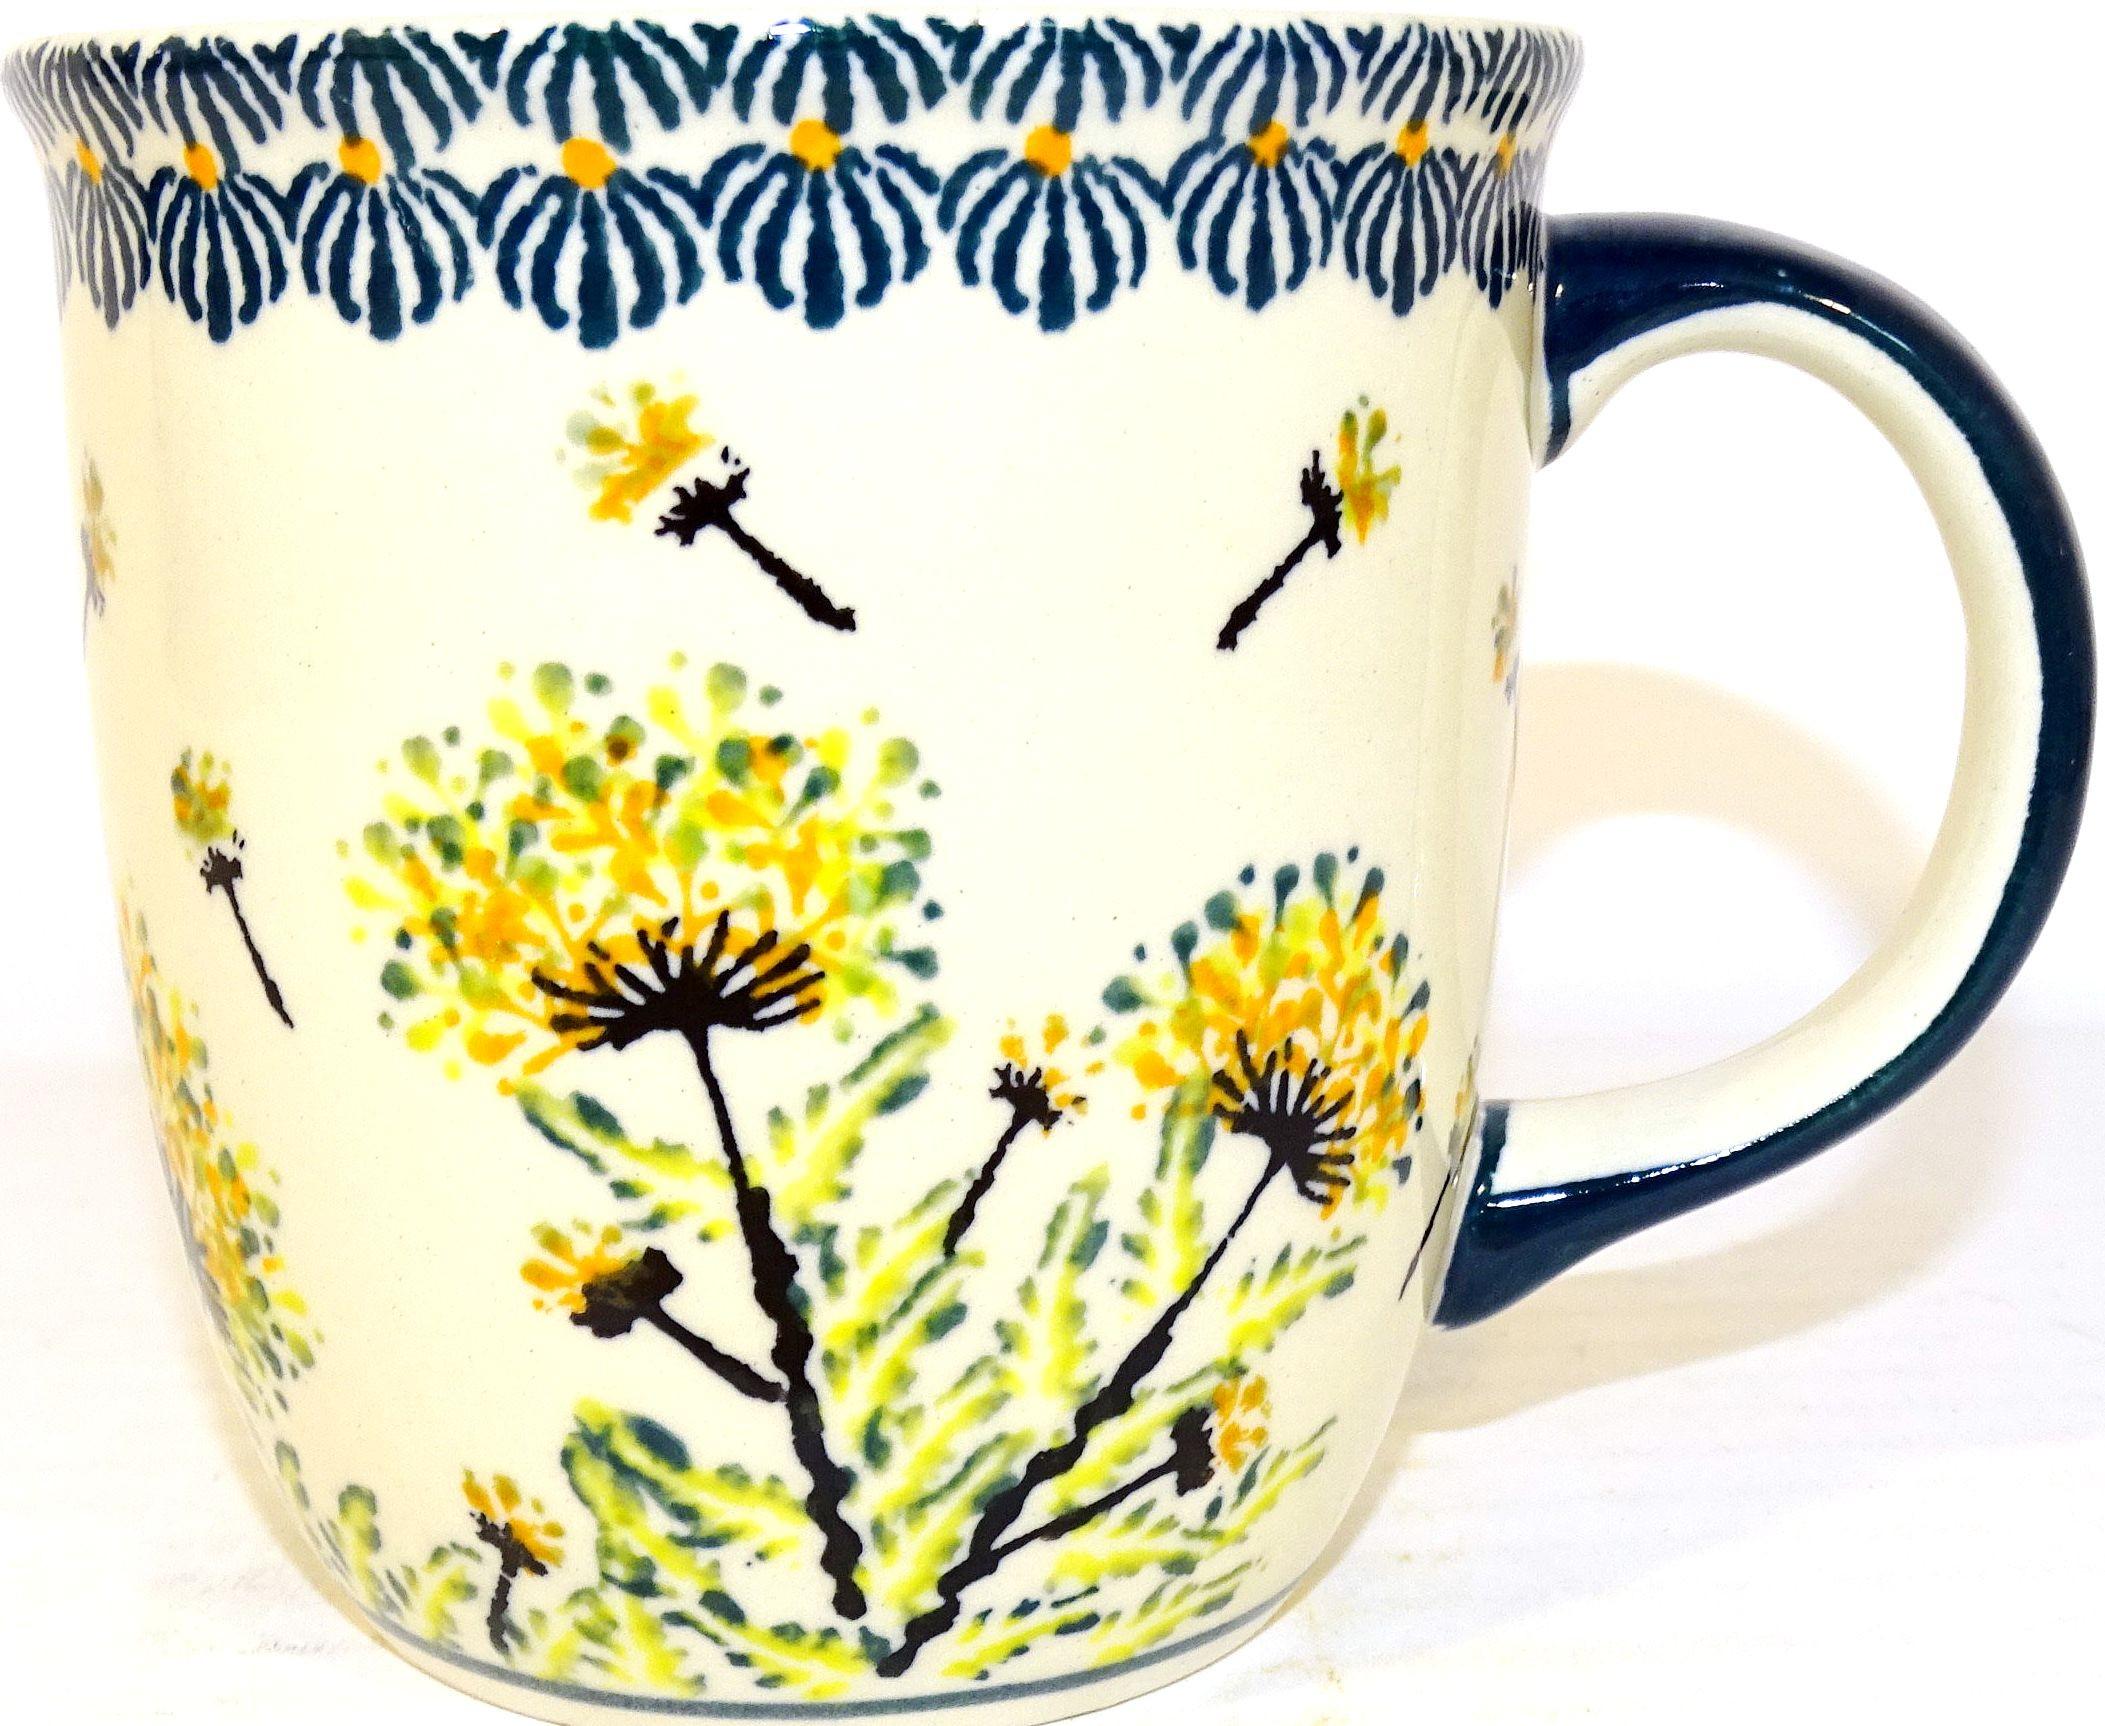 Polish Pottery WISH 12-oz Stoneware Mug | ARTISAN